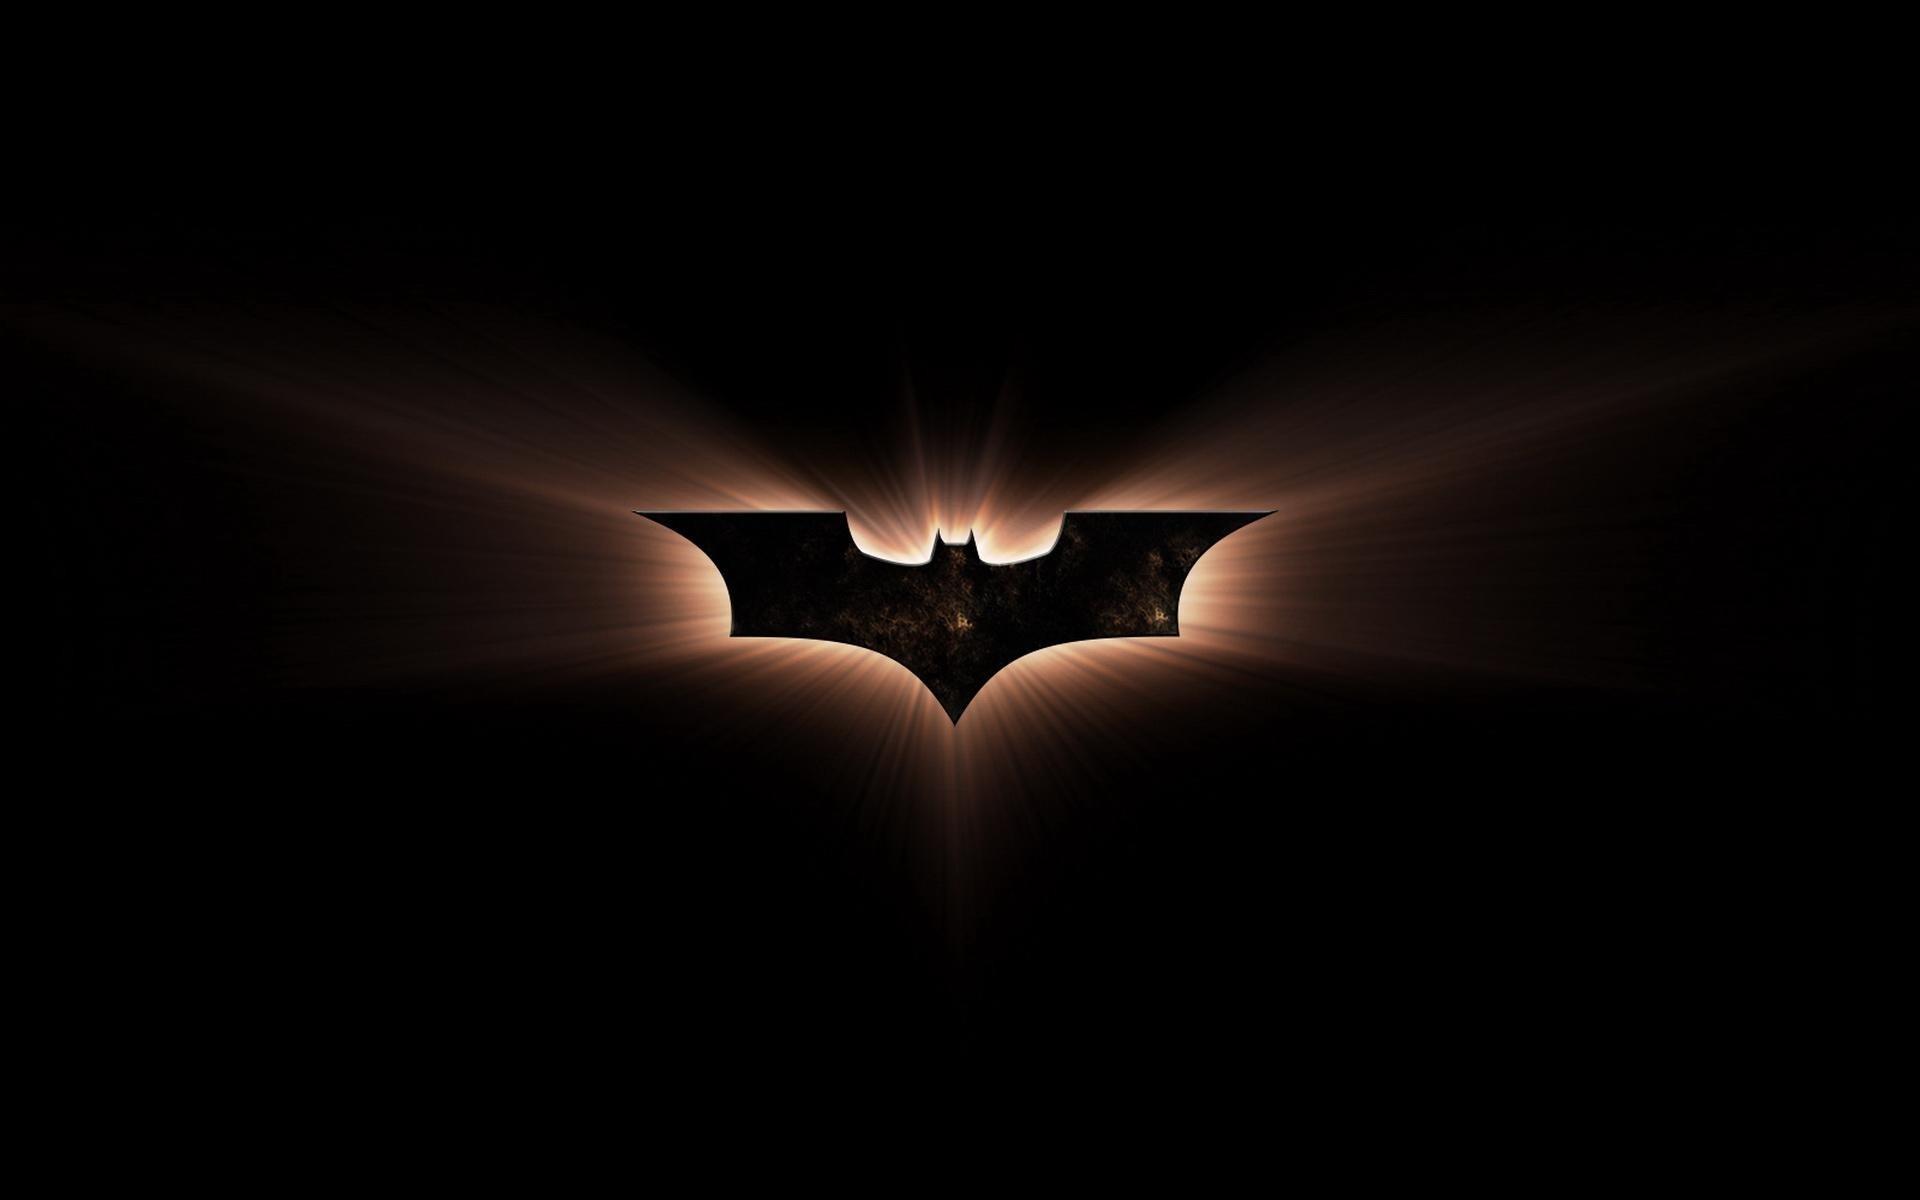 Wonderful Wallpaper Home Screen Batman - 771763-batman-arkham-logo-wallpaper-1920x1200-for-lockscreen  Graphic_628226.jpg